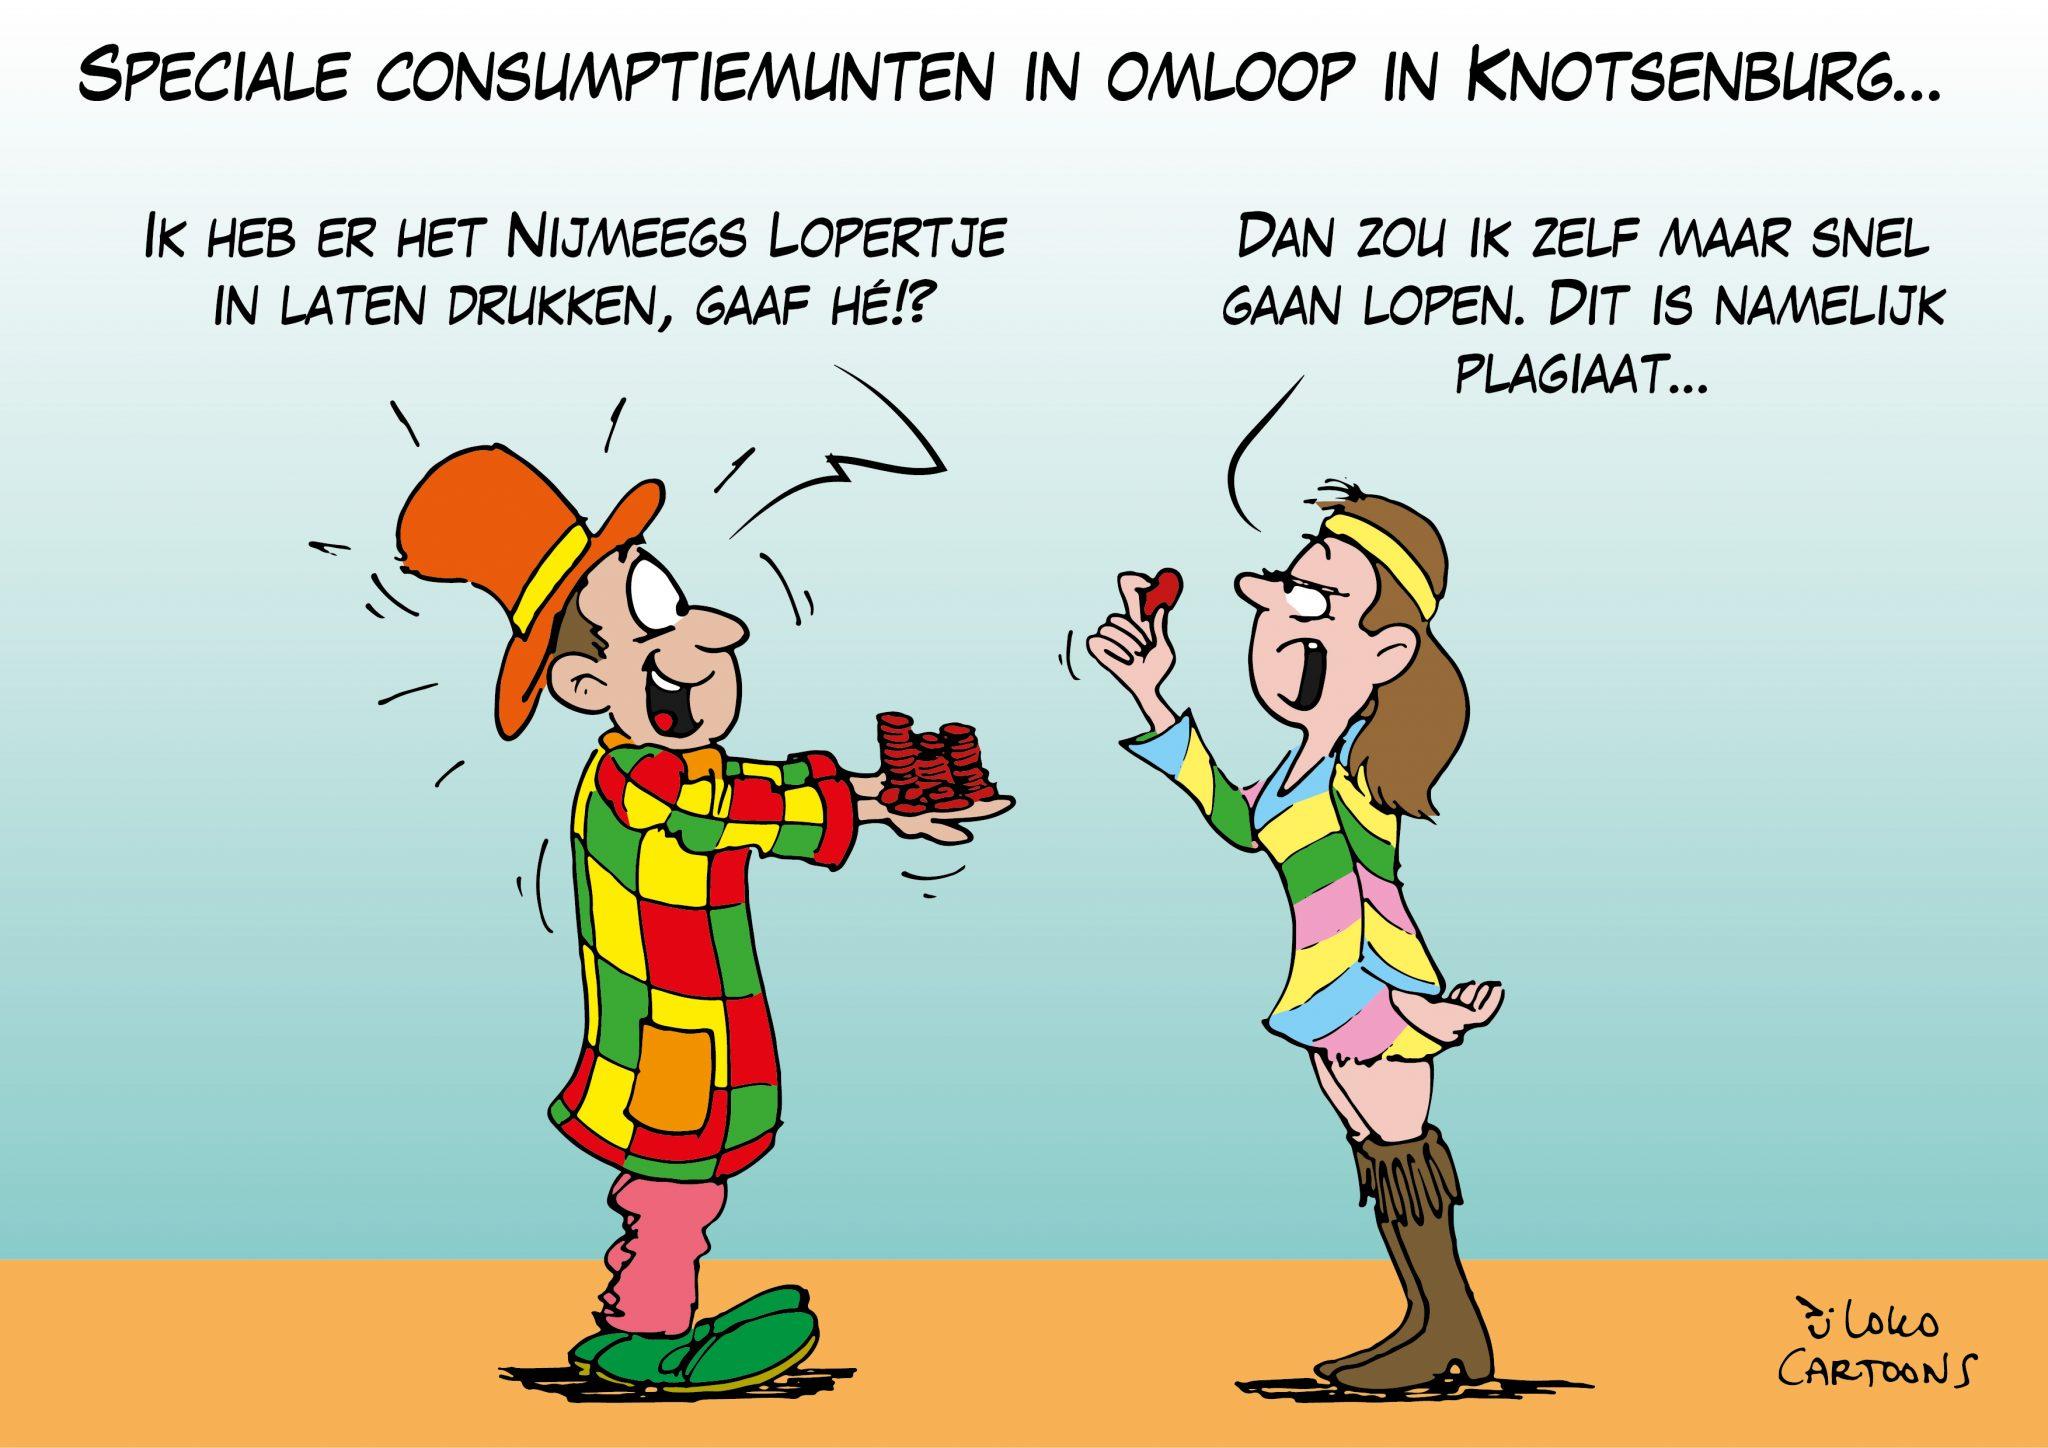 Speciale consumptiemunten in omloop Knotsenburg…